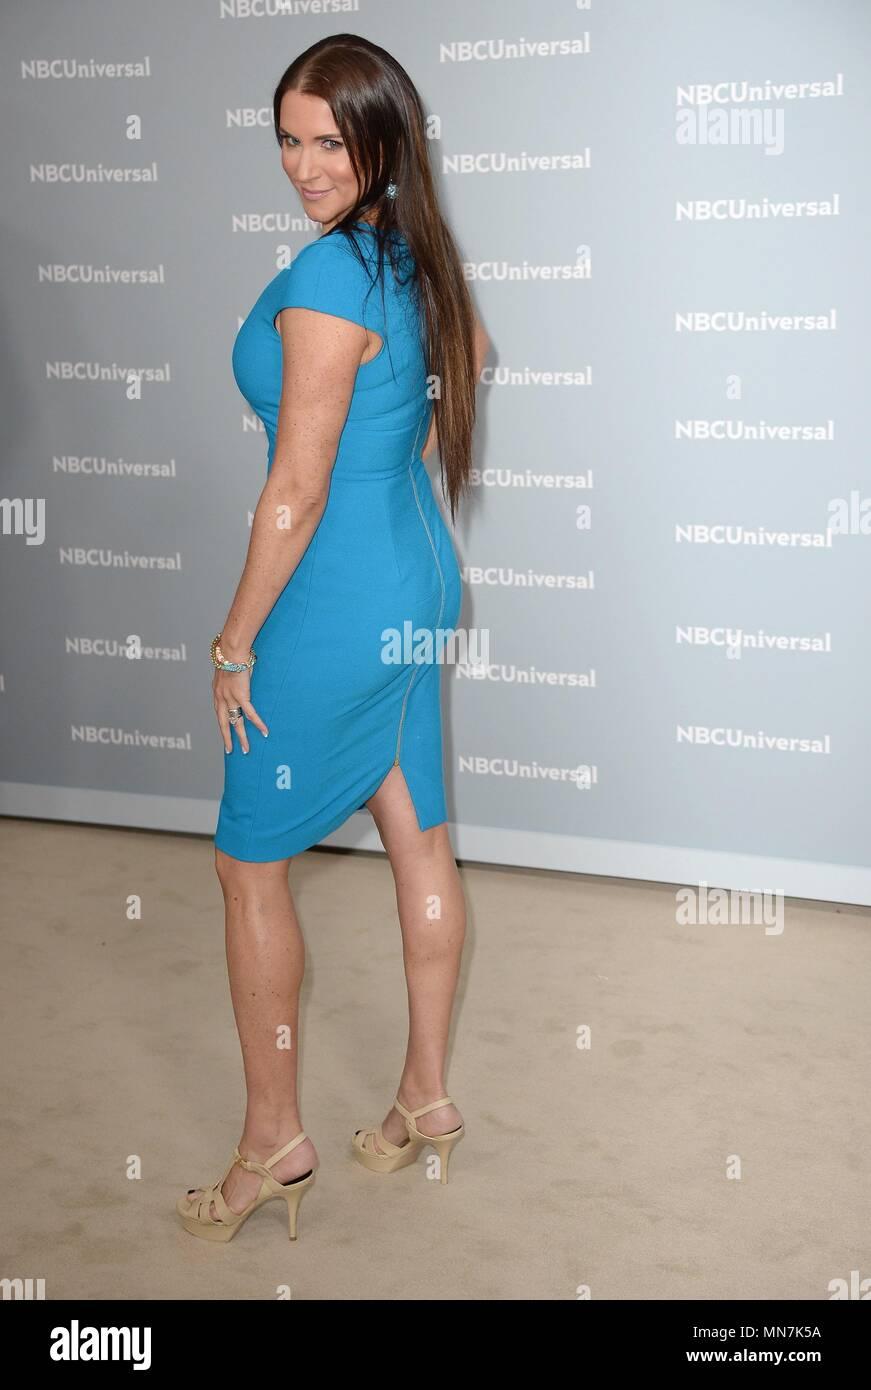 New York, NY, USA. 14th May, 2018. Stephanie McMahon at arrivals for NBC Universal Upfront 2018 - Part 2, Rockefeller Plaza, New York, NY May 14, 2018. Credit: Kristin Callahan/Everett Collection/Alamy Live News - Stock Image